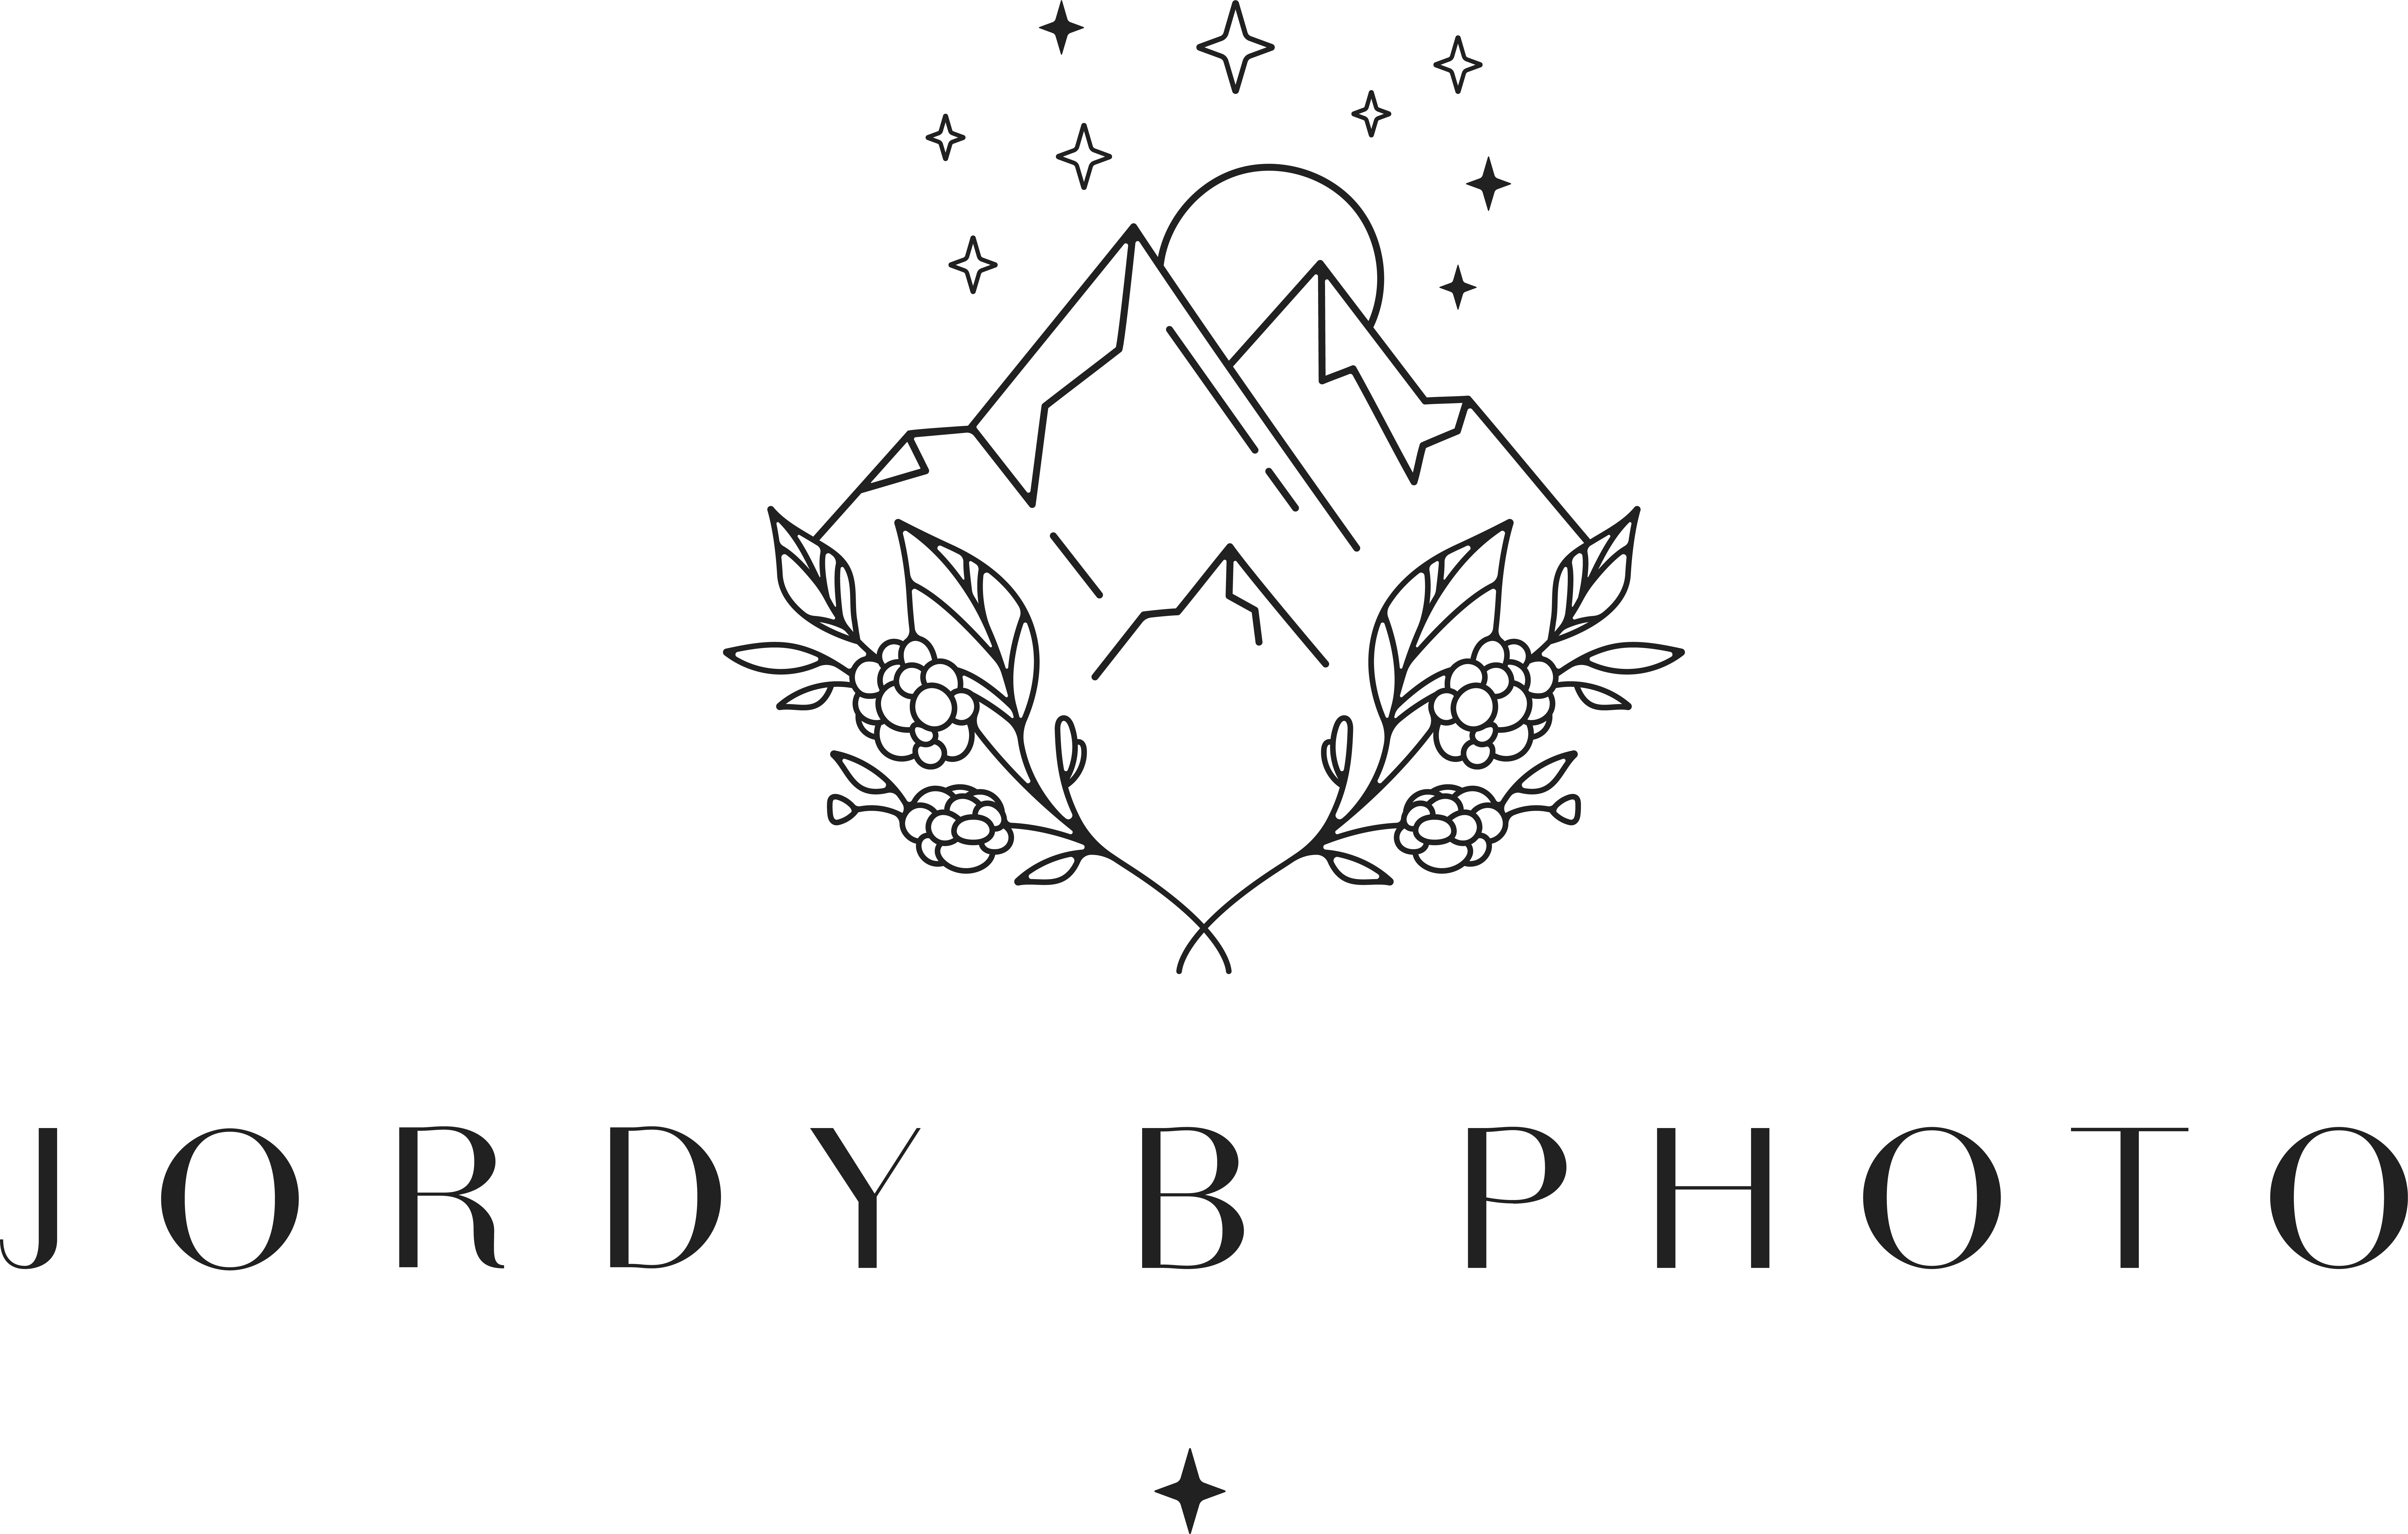 Jordy B Photo